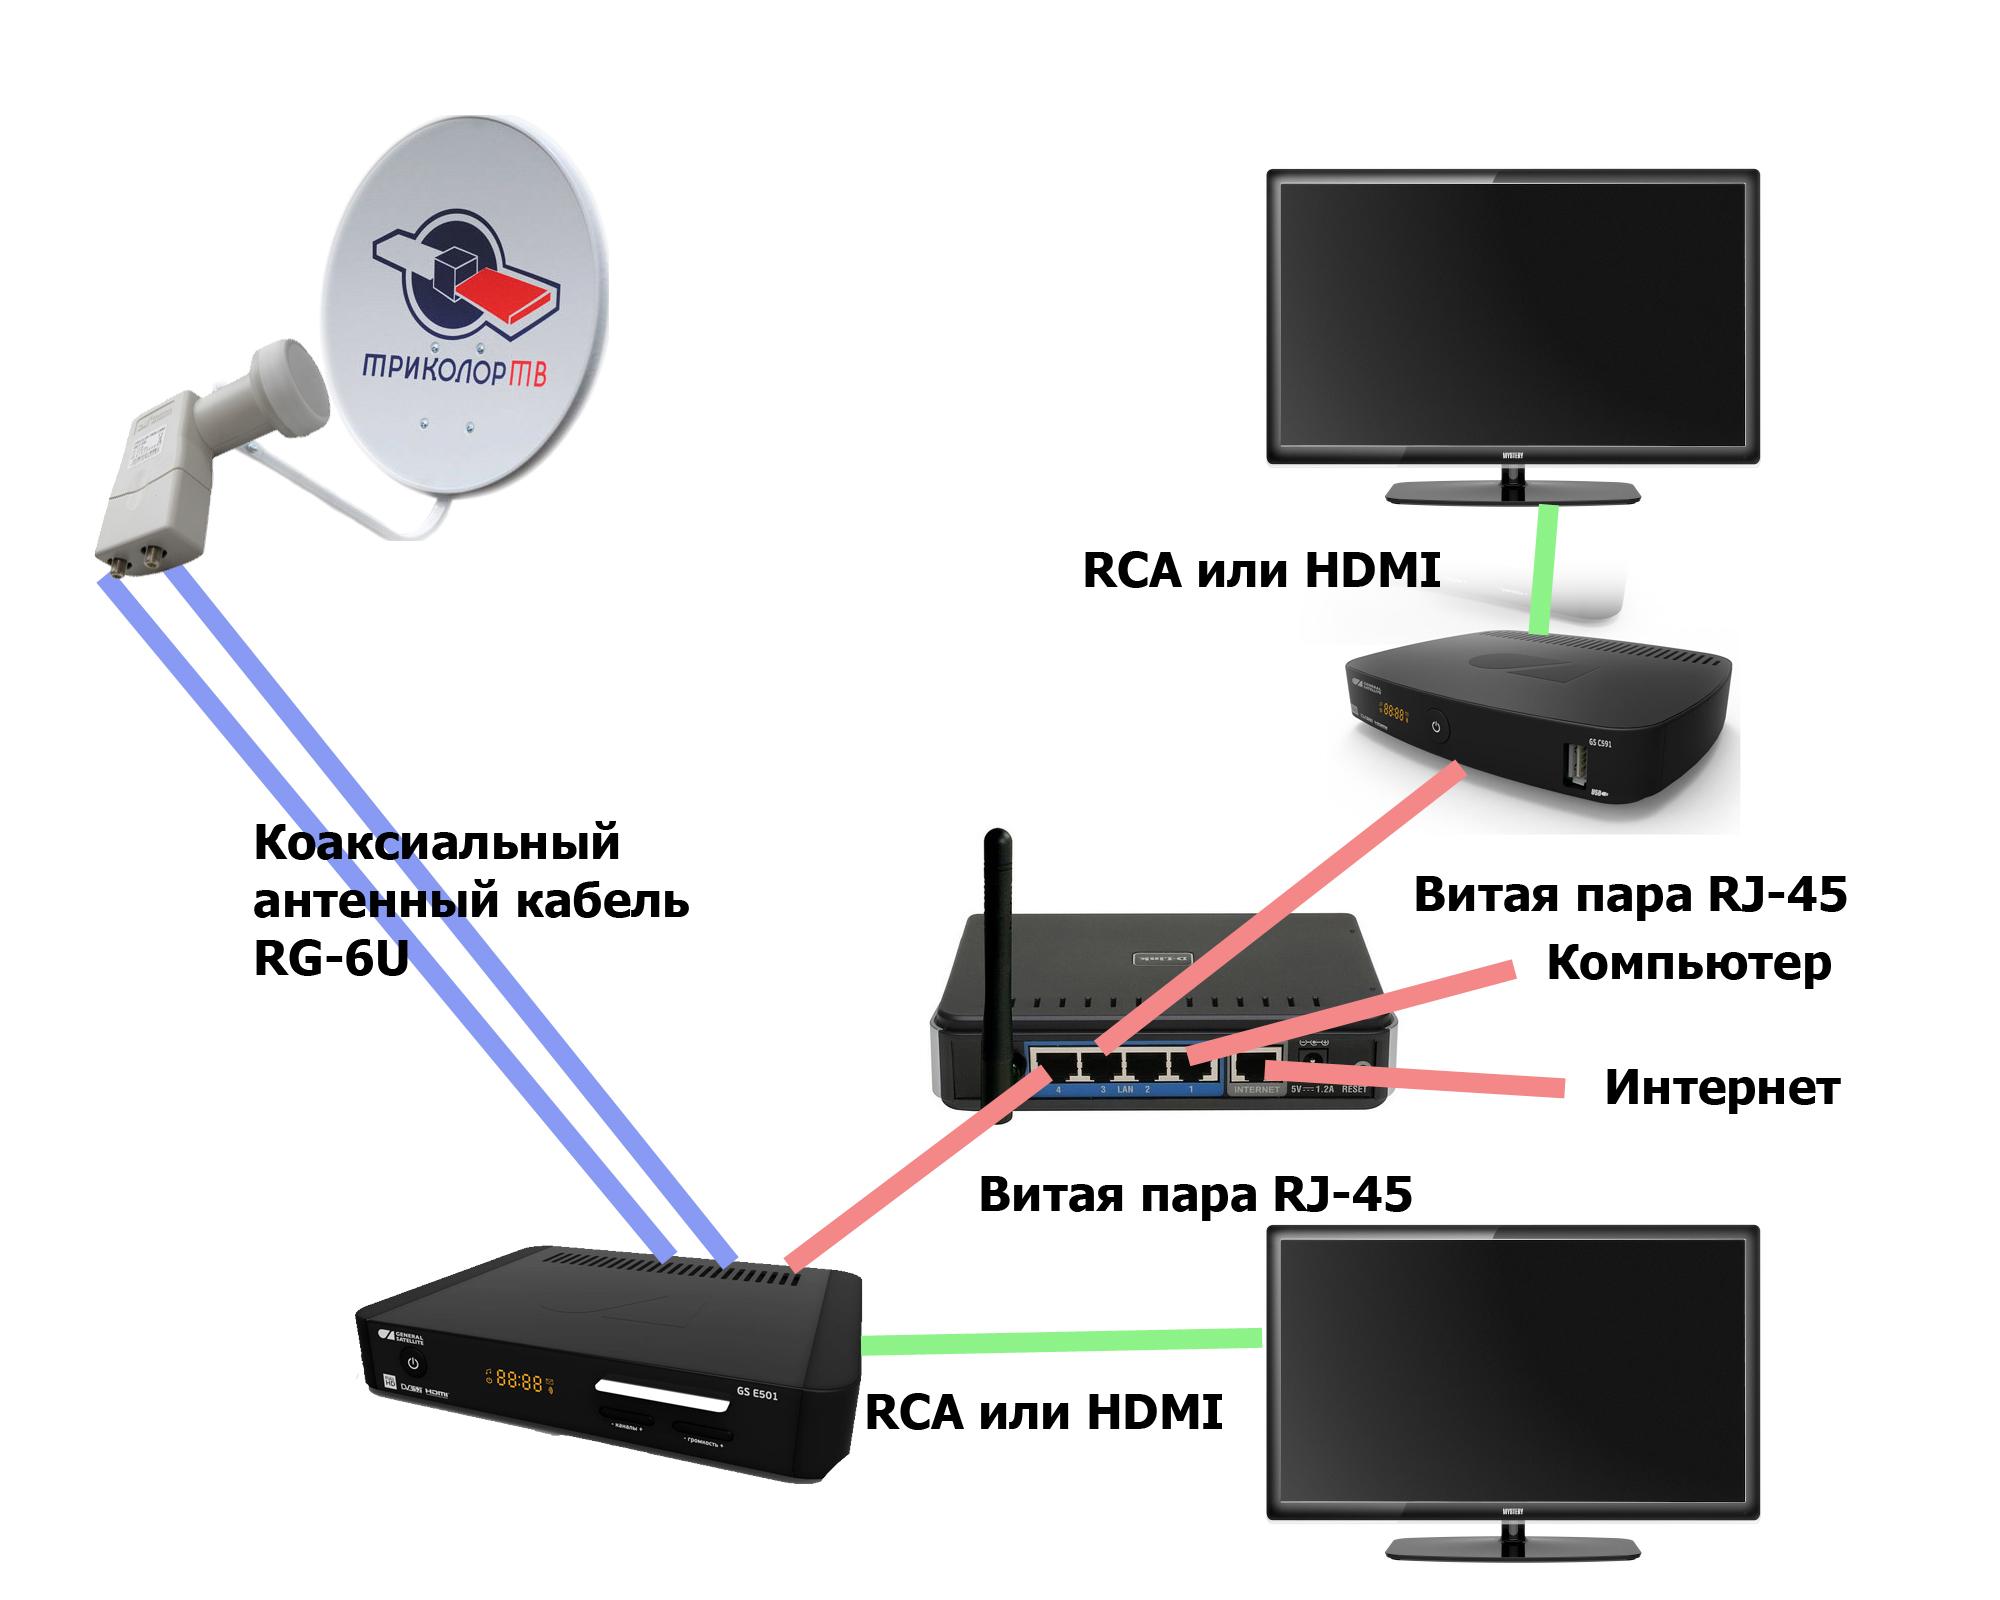 Как подключить два телевизора в домашних условиях